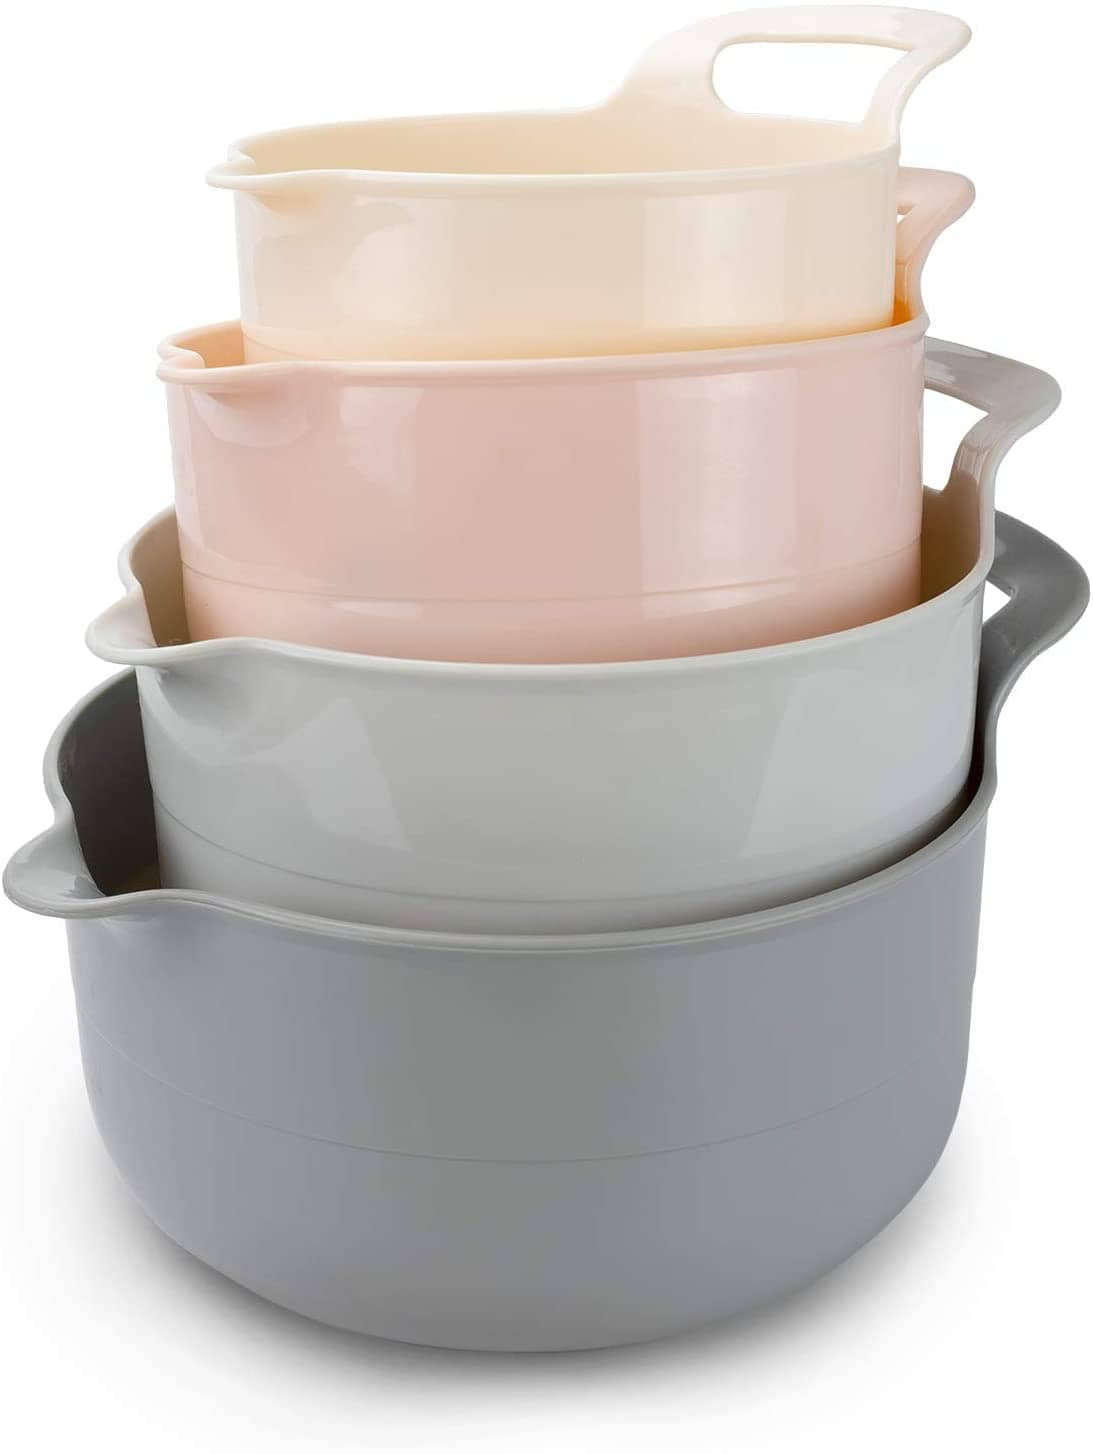 tiktok home items mixing bowl set 1